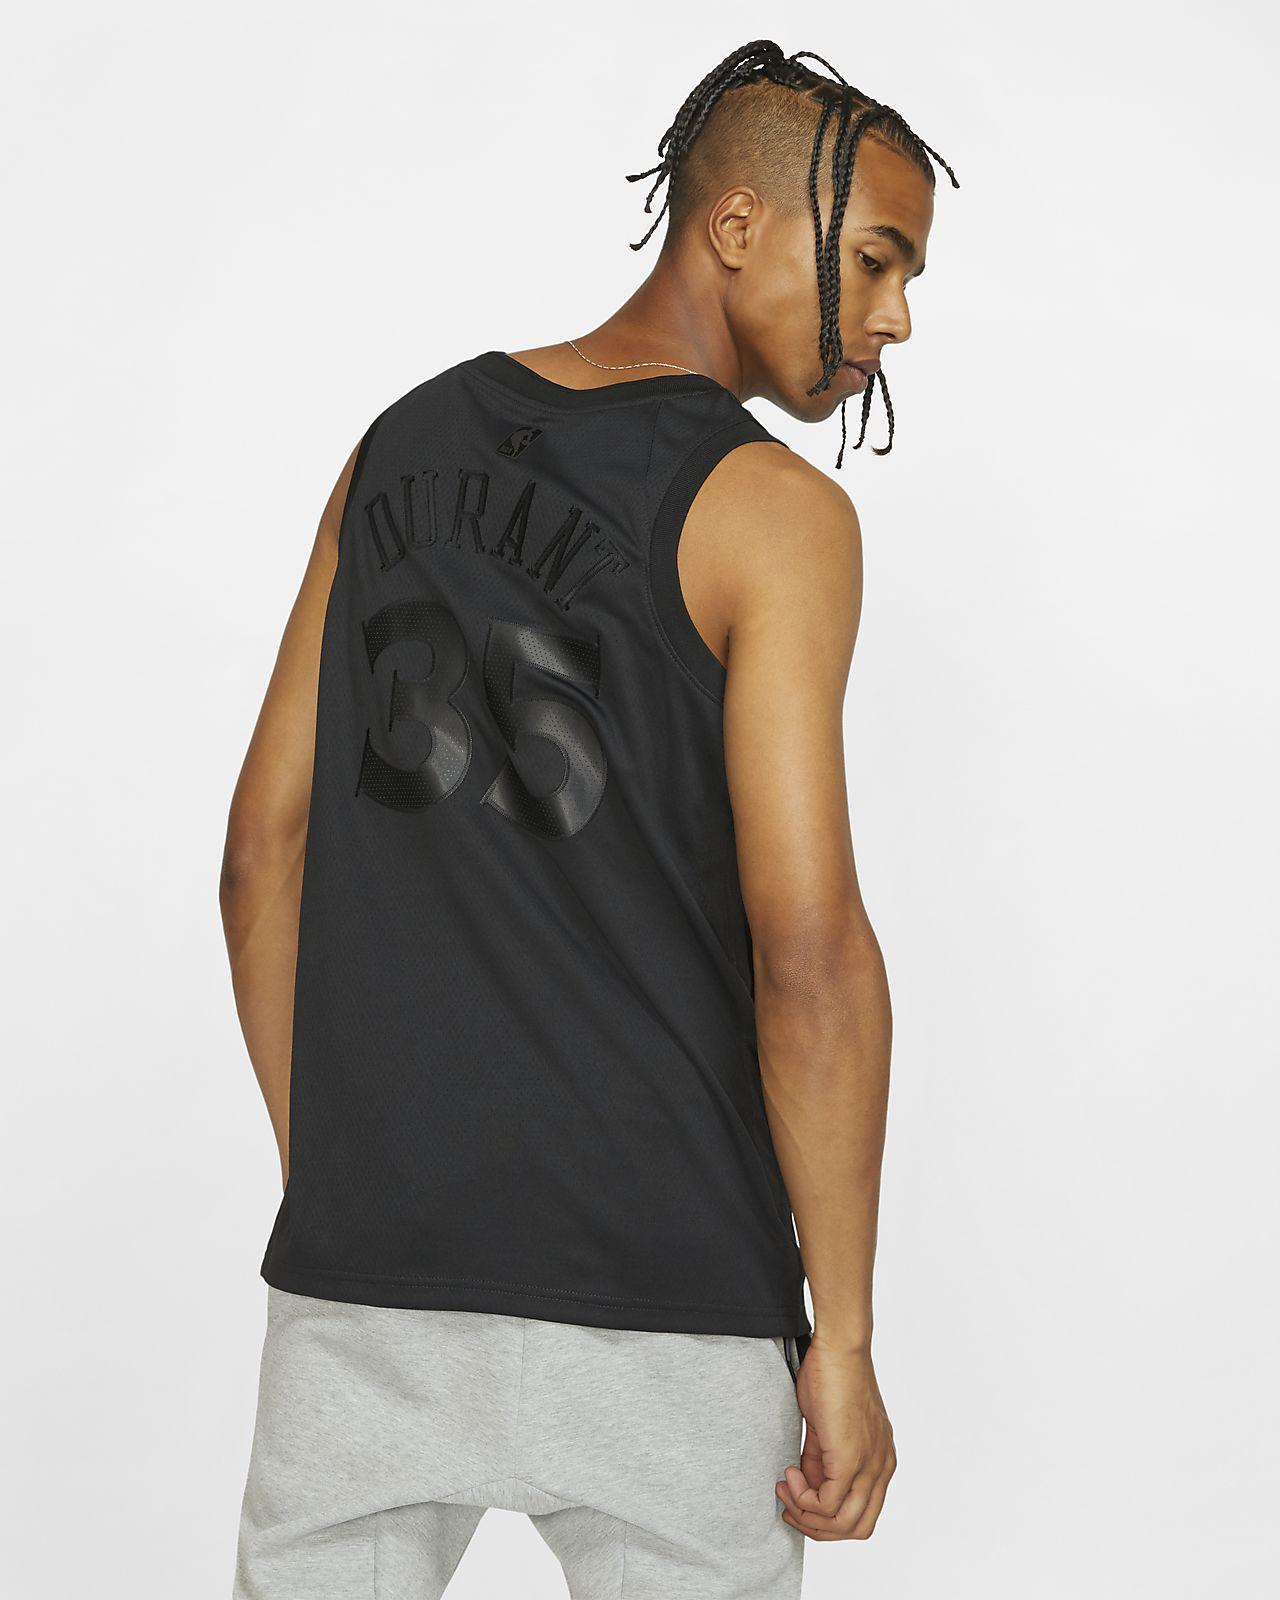 9cd687607b6 ... Camiseta conectada Nike NBA para hombre Kevin Durant MVP Swingman  (Golden State Warriors)